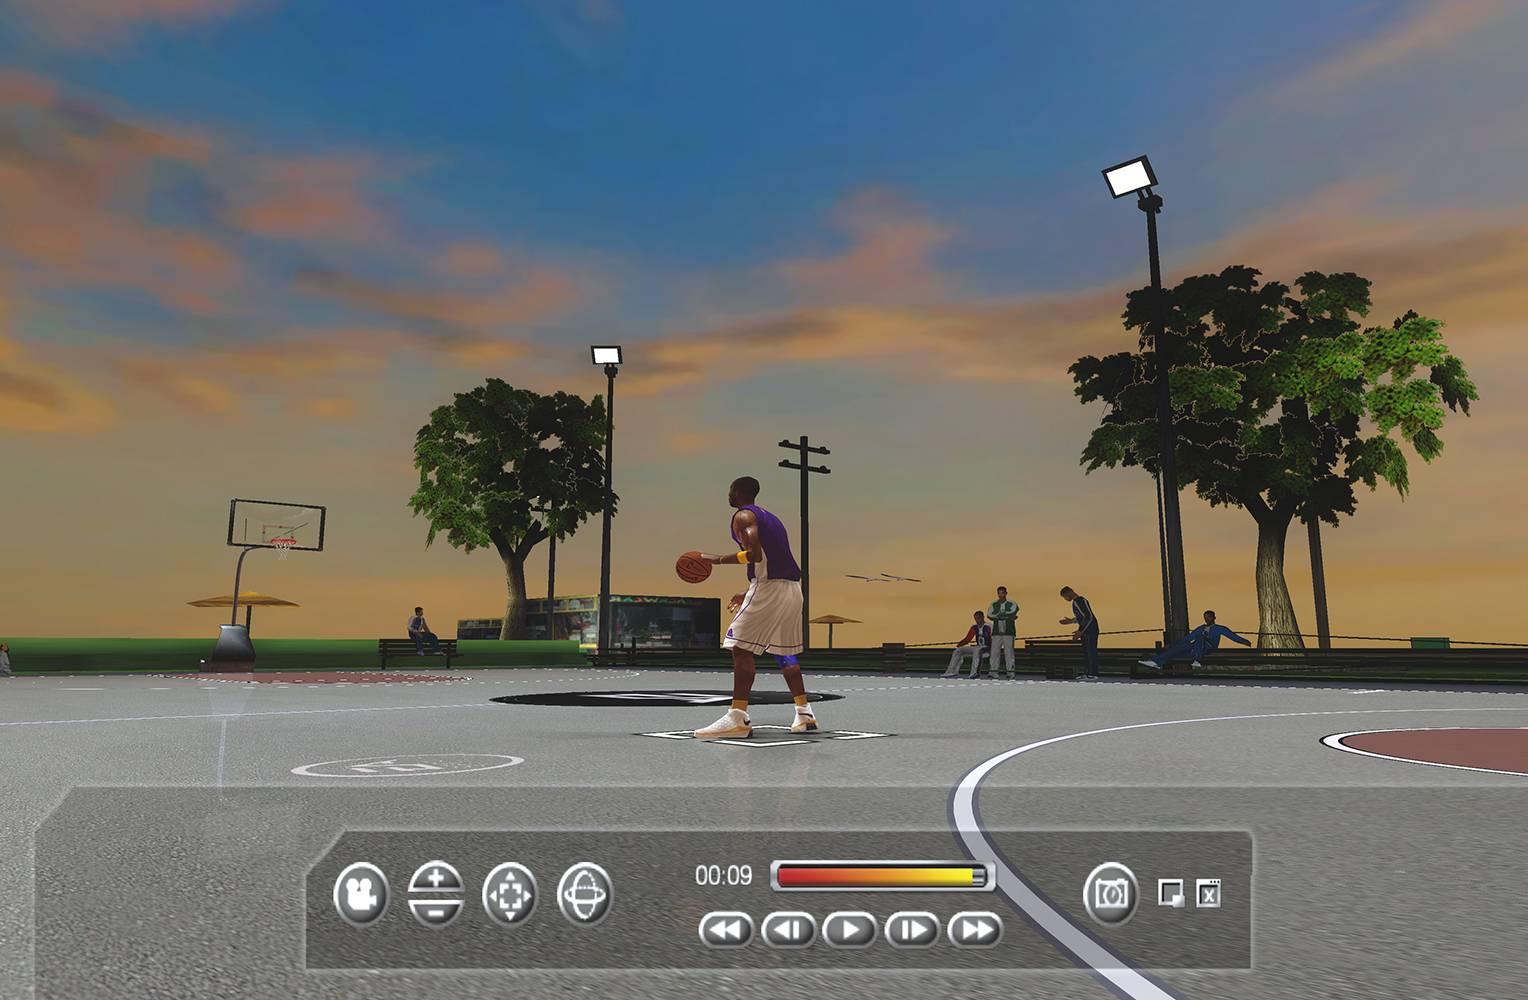 NBA LIVE 08【4K】-2021-03-23-01-09-41-793副本.jpg